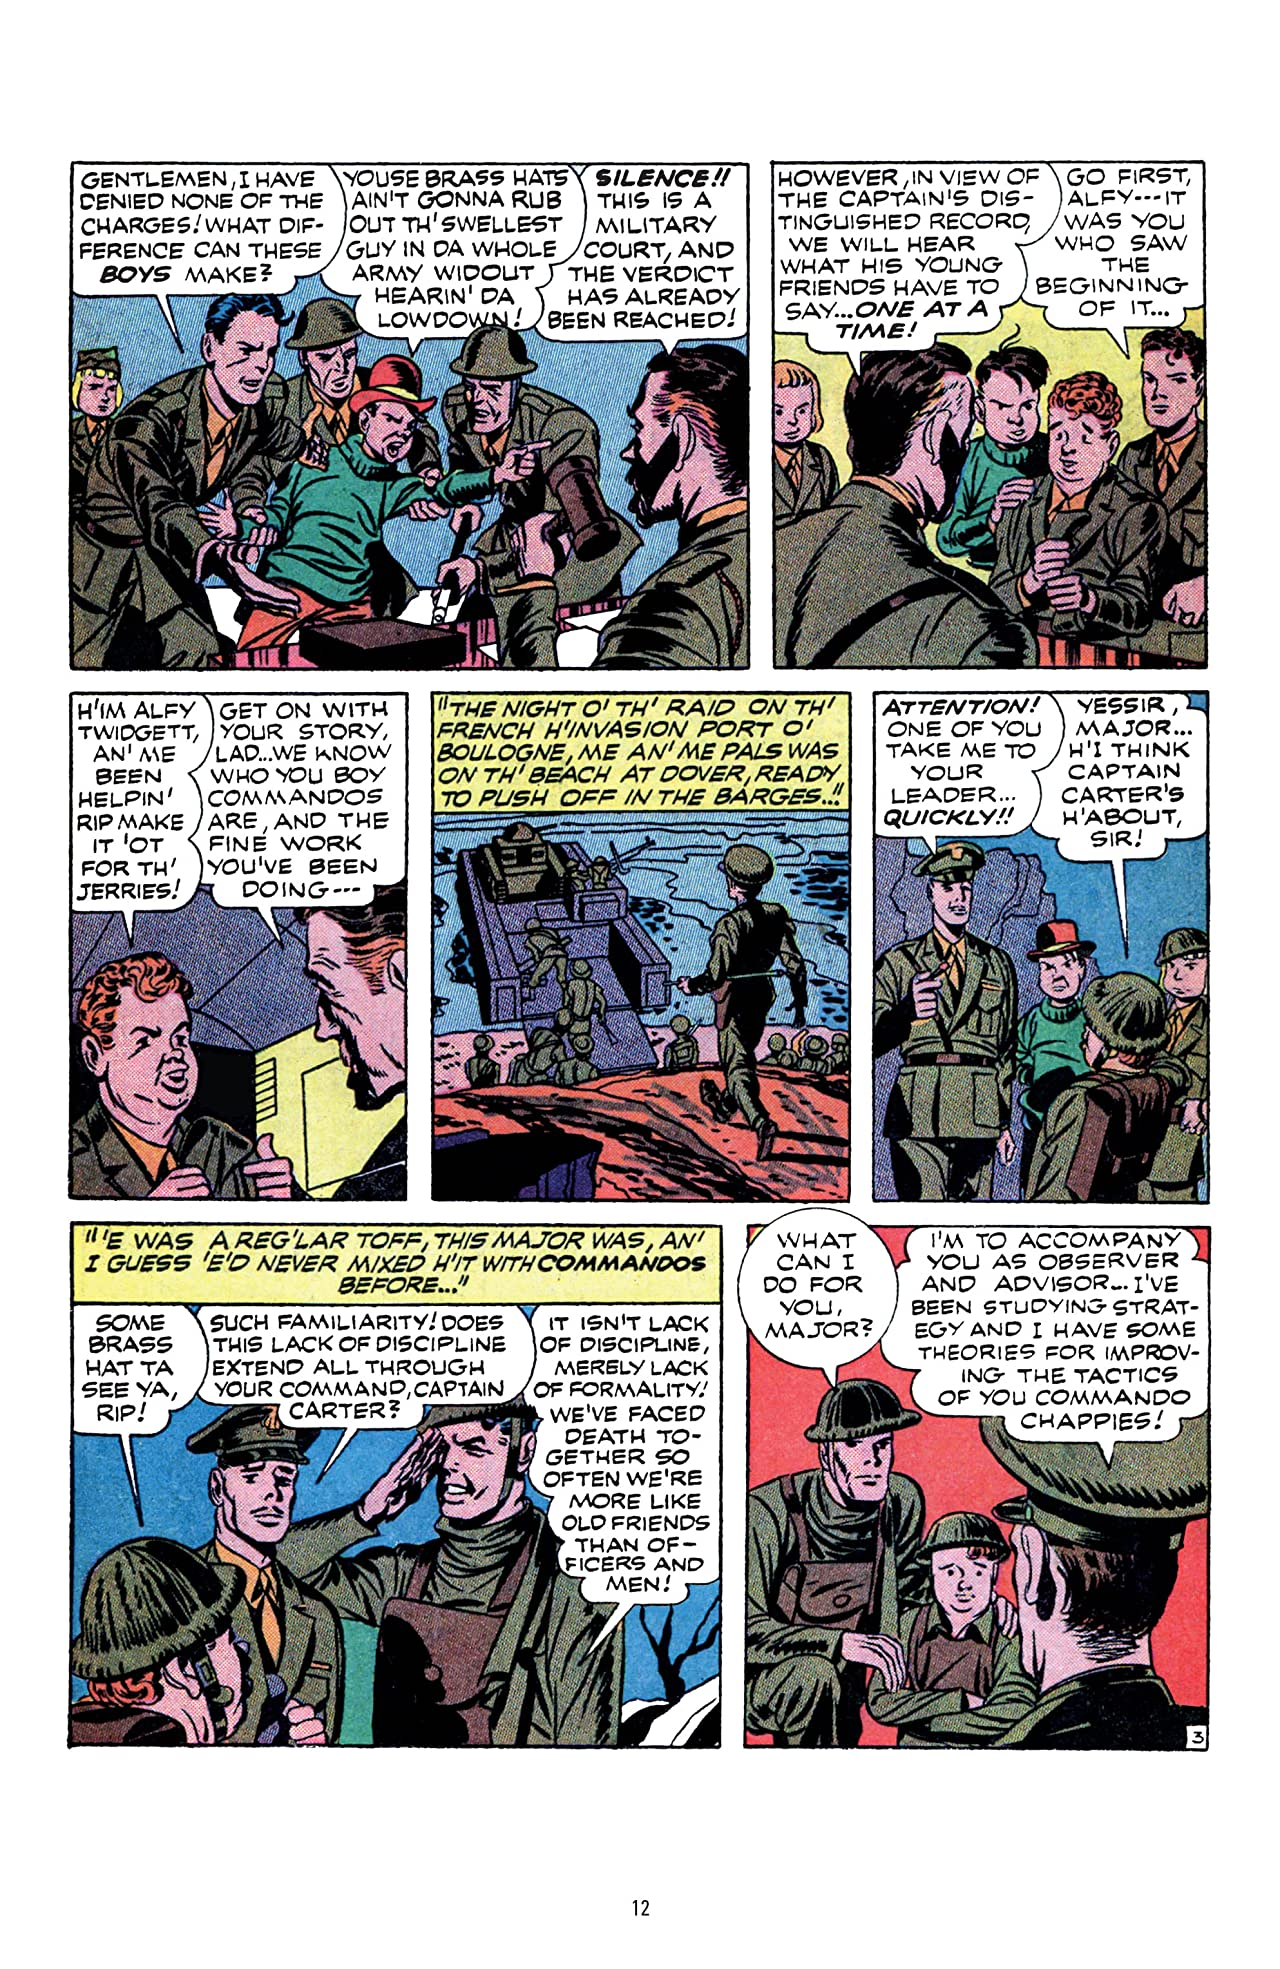 Boy Commandos by Joe Simon and Jack Kirby Tome 2